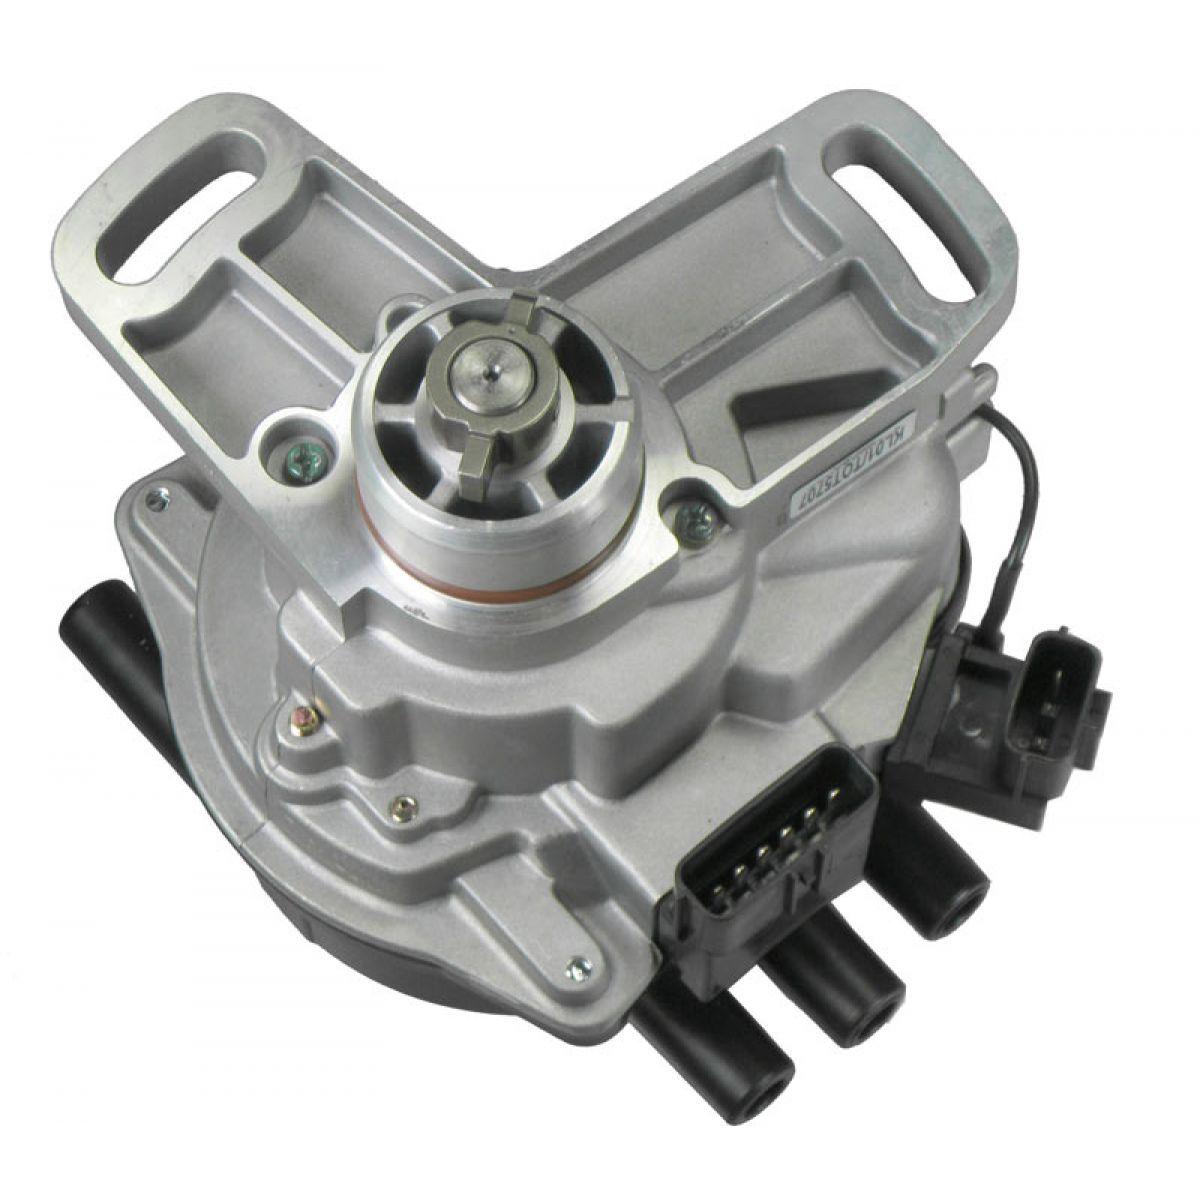 Ignition Distributor NEW For Ford Probe Mazda 626 MX-3 MX